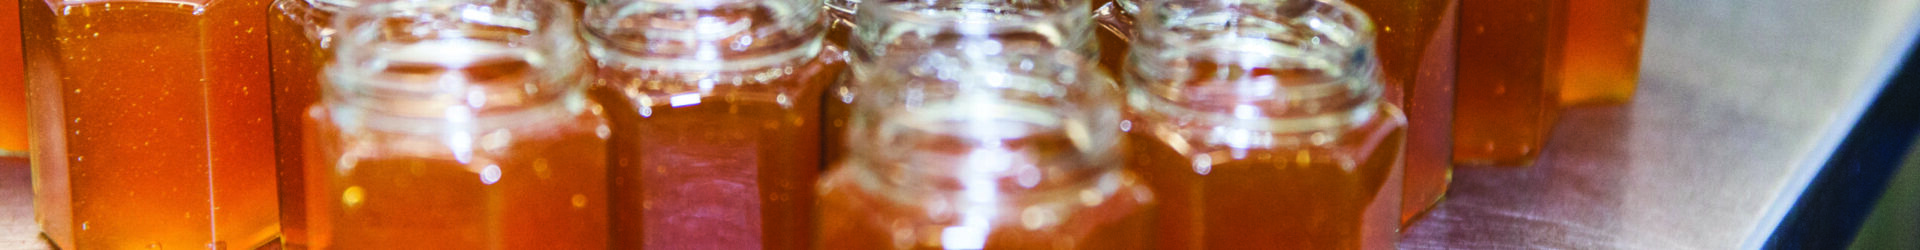 honey factory jars